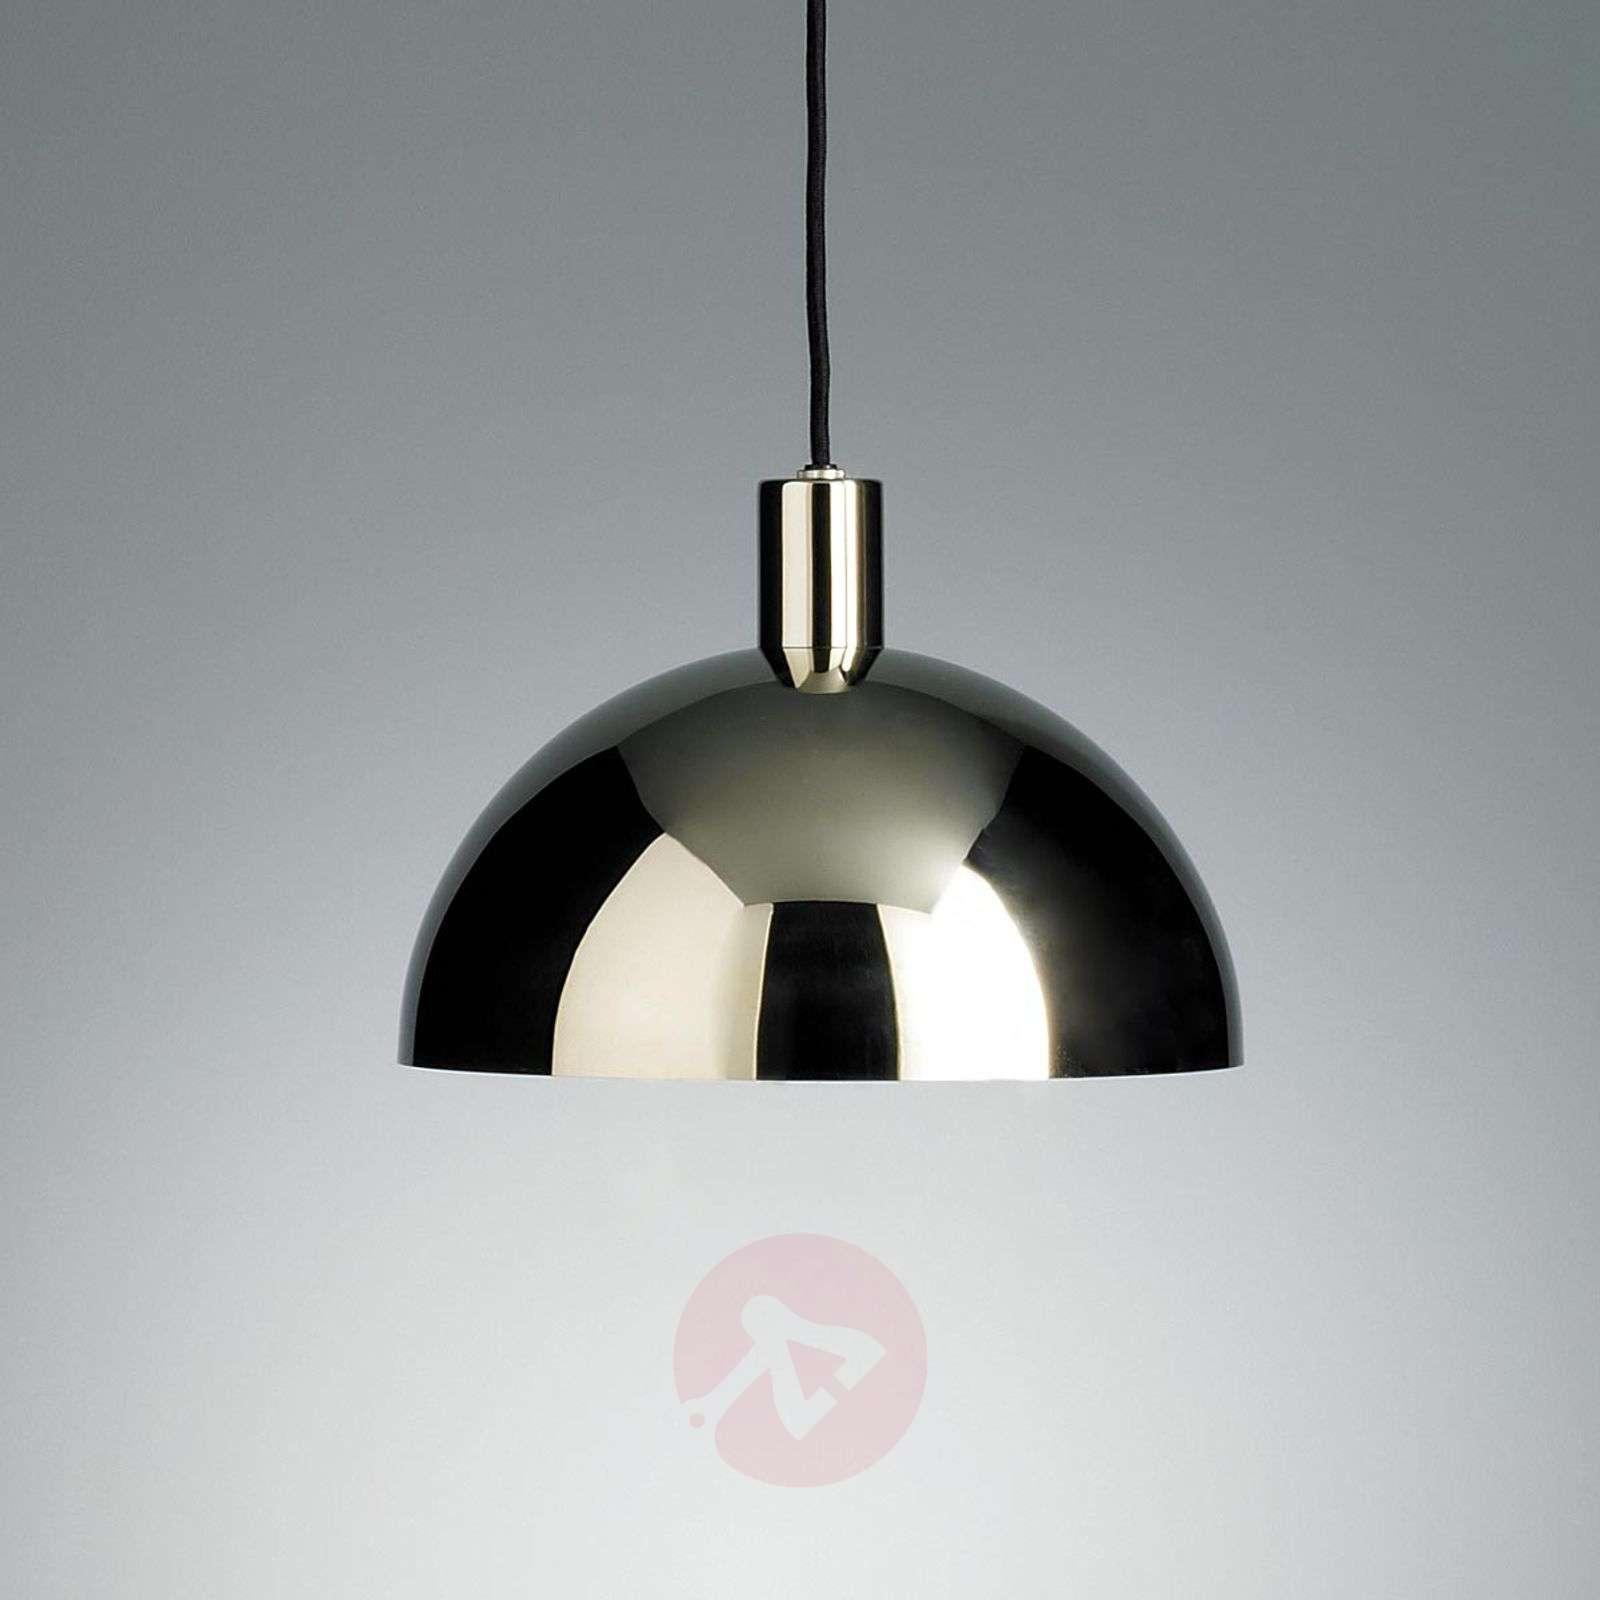 Bauhaus hanging light from 1925-9030127X-01